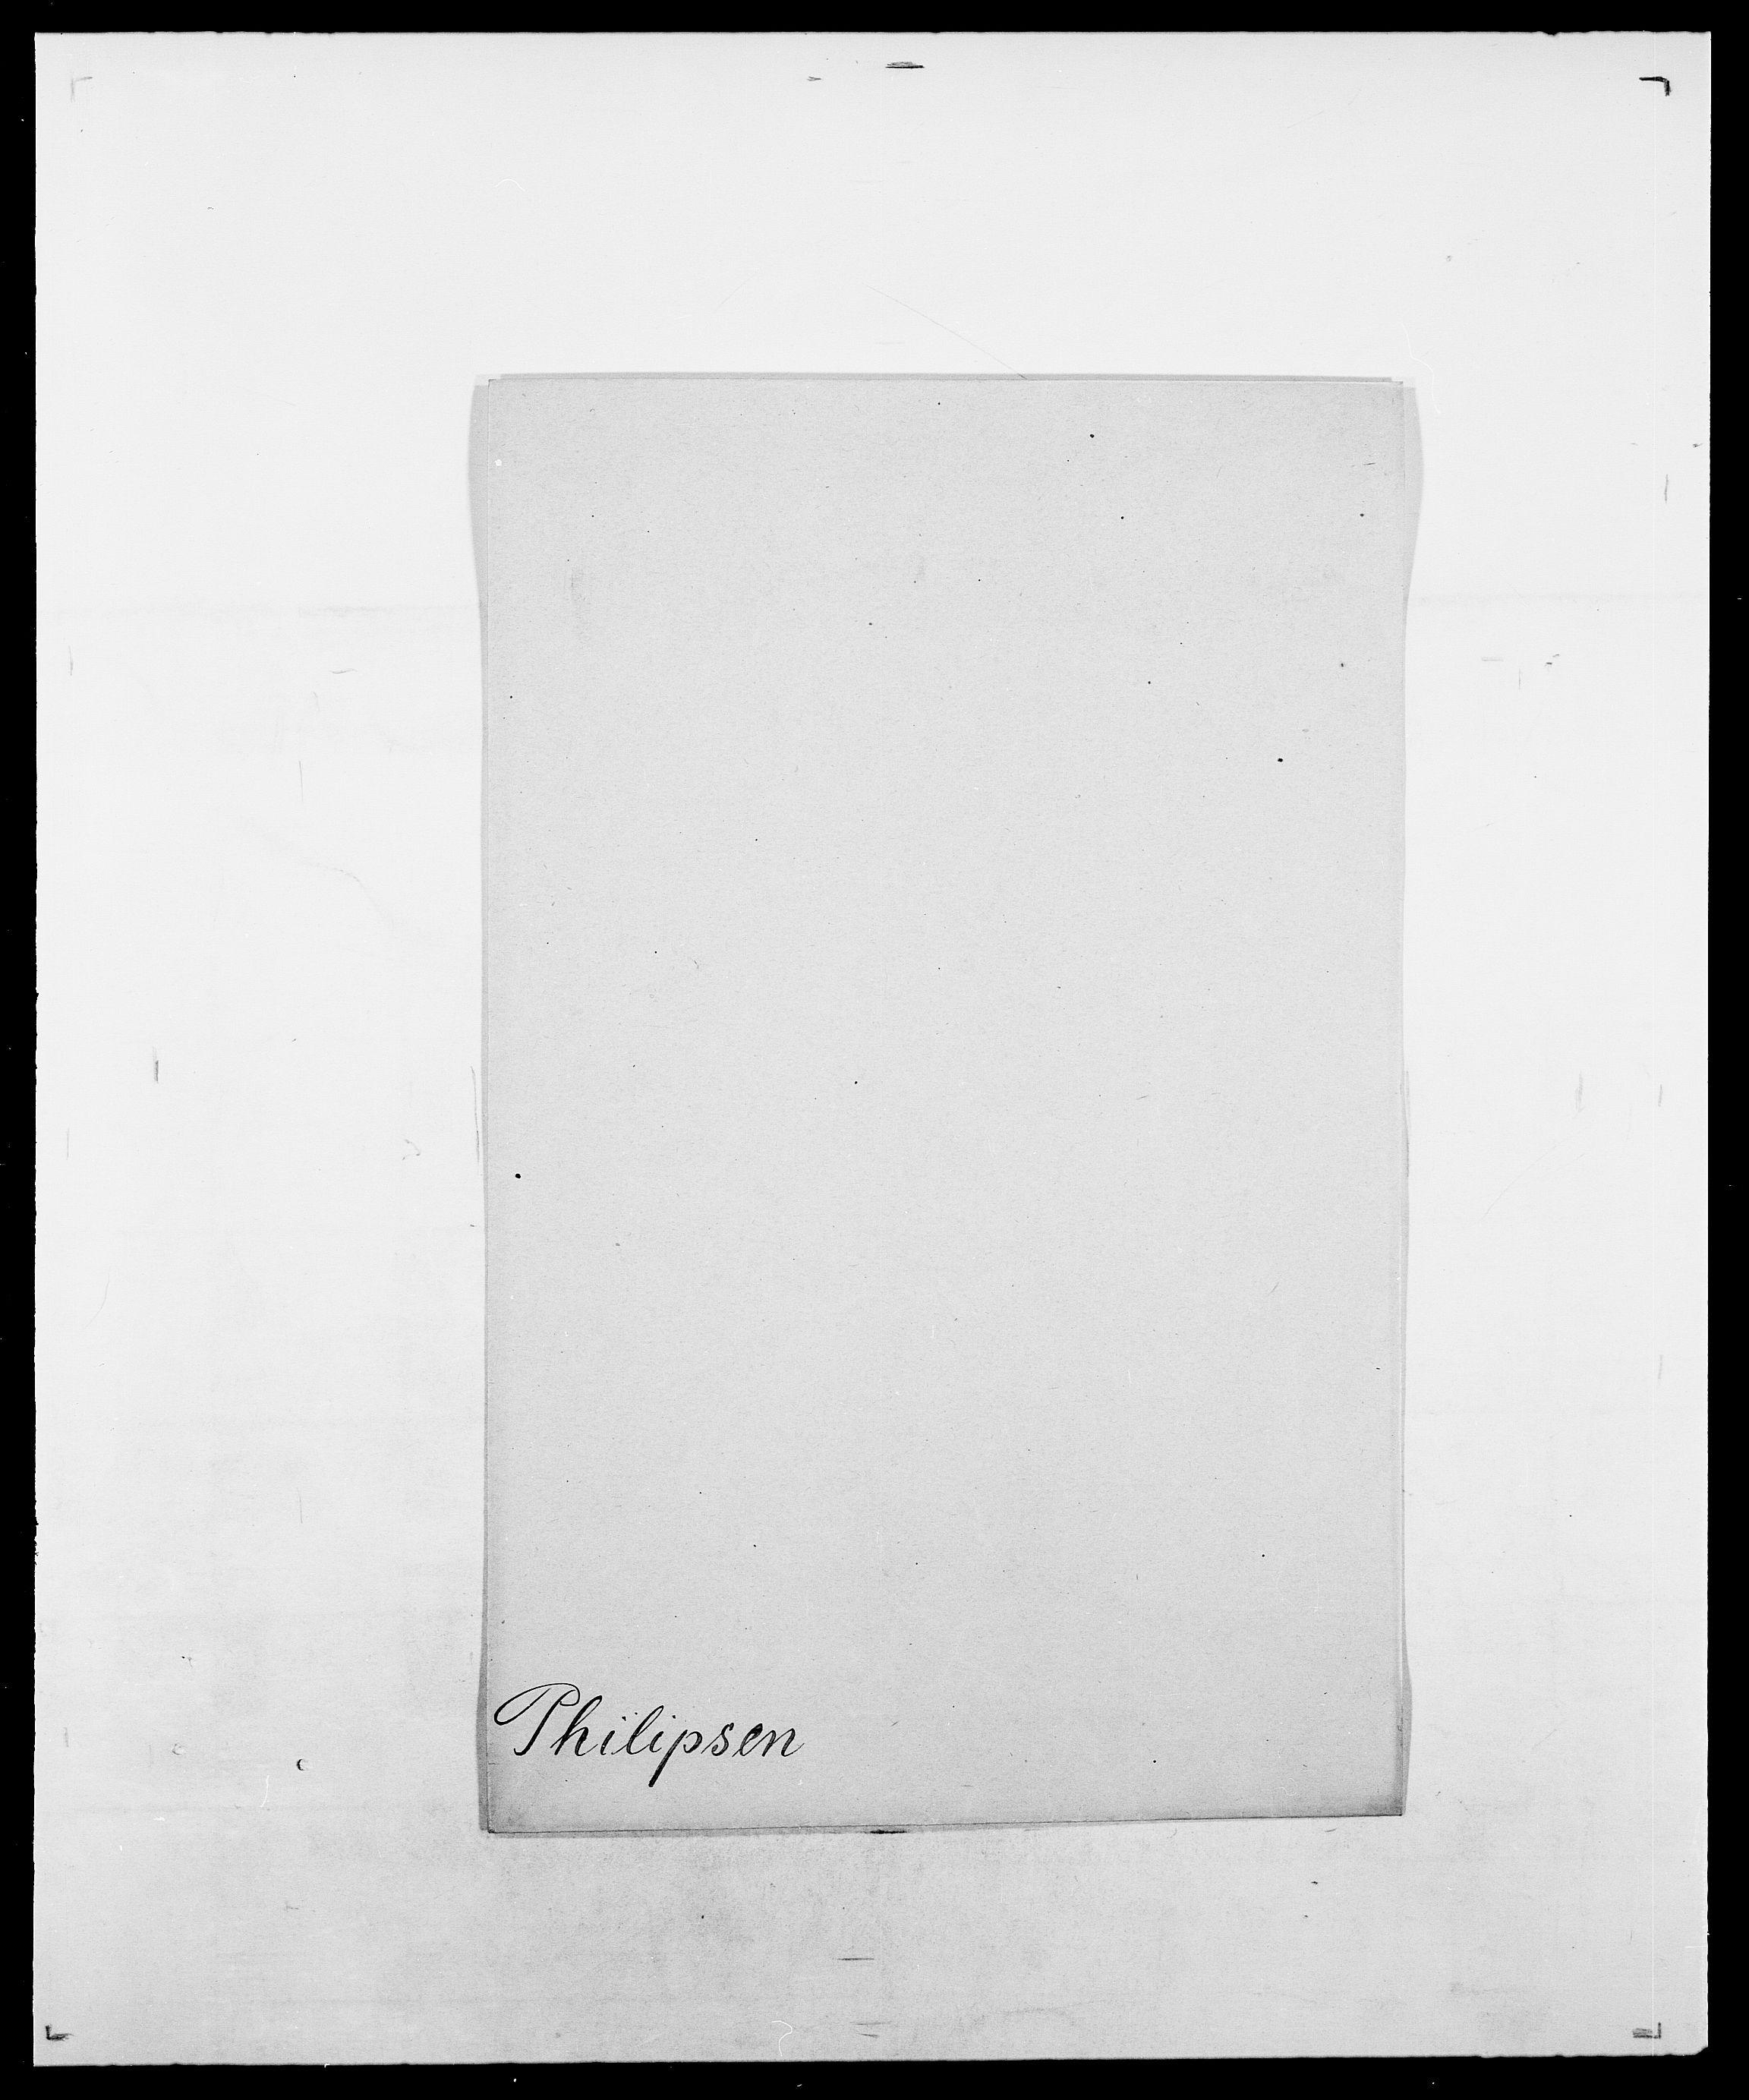 SAO, Delgobe, Charles Antoine - samling, D/Da/L0030: Paars - Pittelkov, s. 518